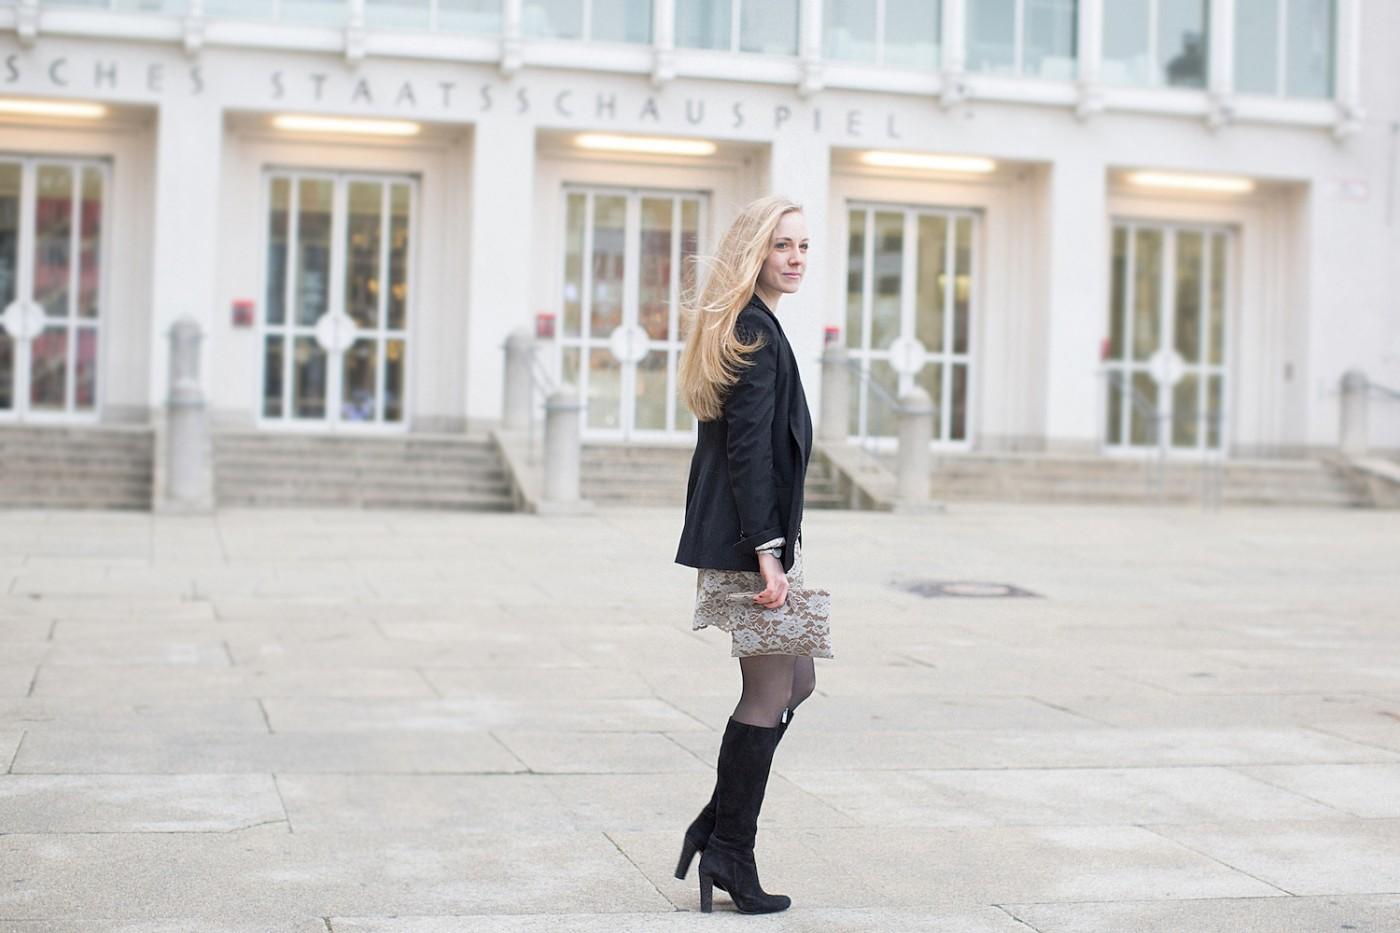 lace skirt, Alexandra Kasper Photography, blogger outfit with hat, The Golden Bun | München Modeblog, German Fashion Blog, Fashionblogger, new trends